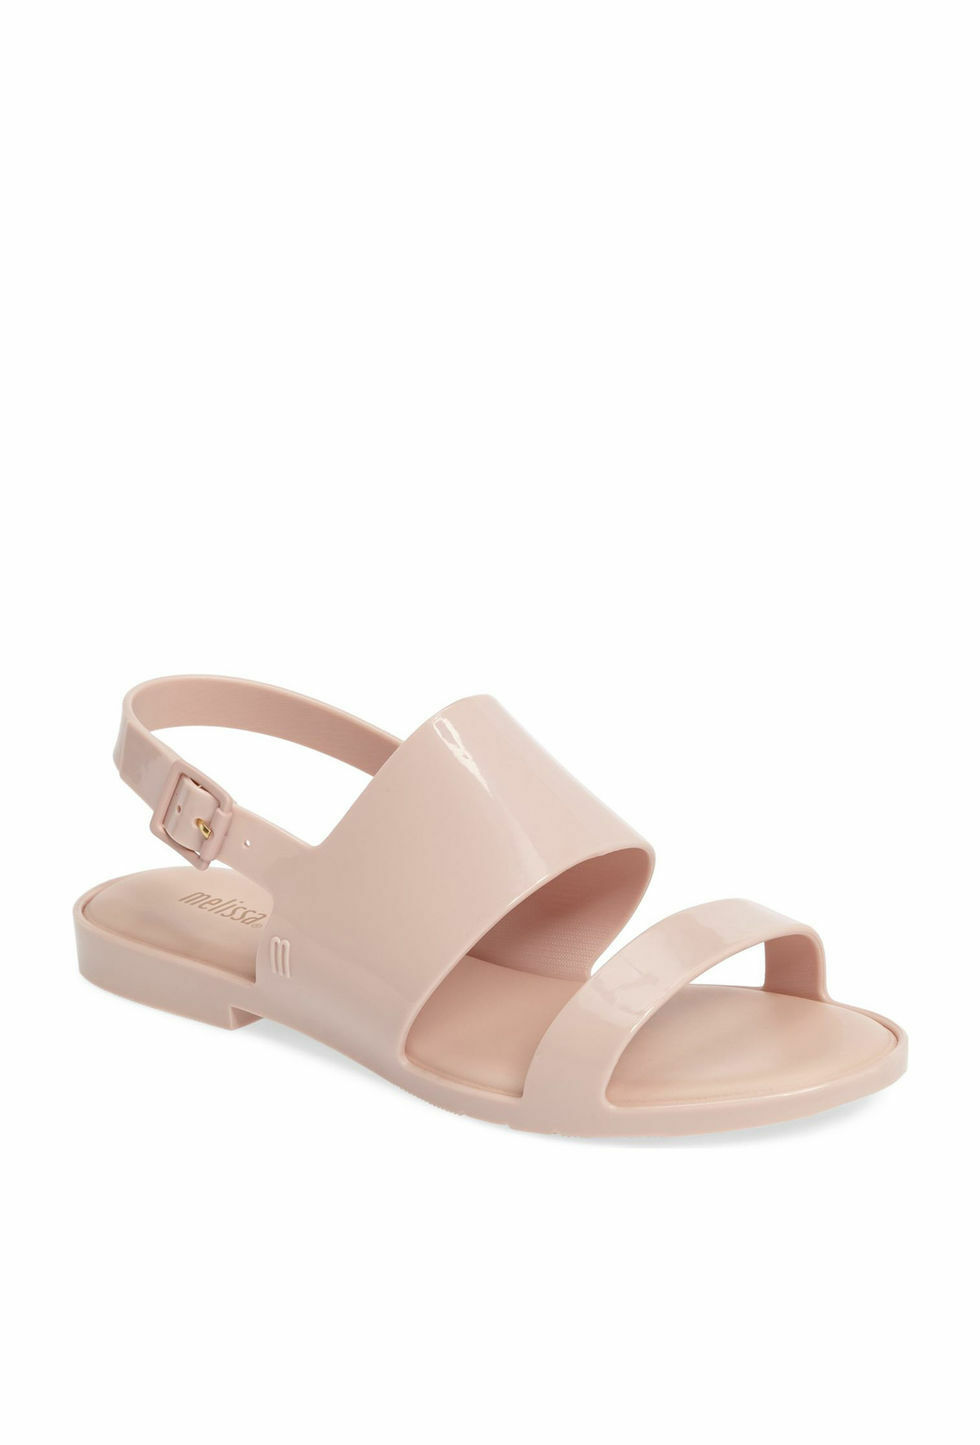 NWB Melissa Light Pink Classy Sandals